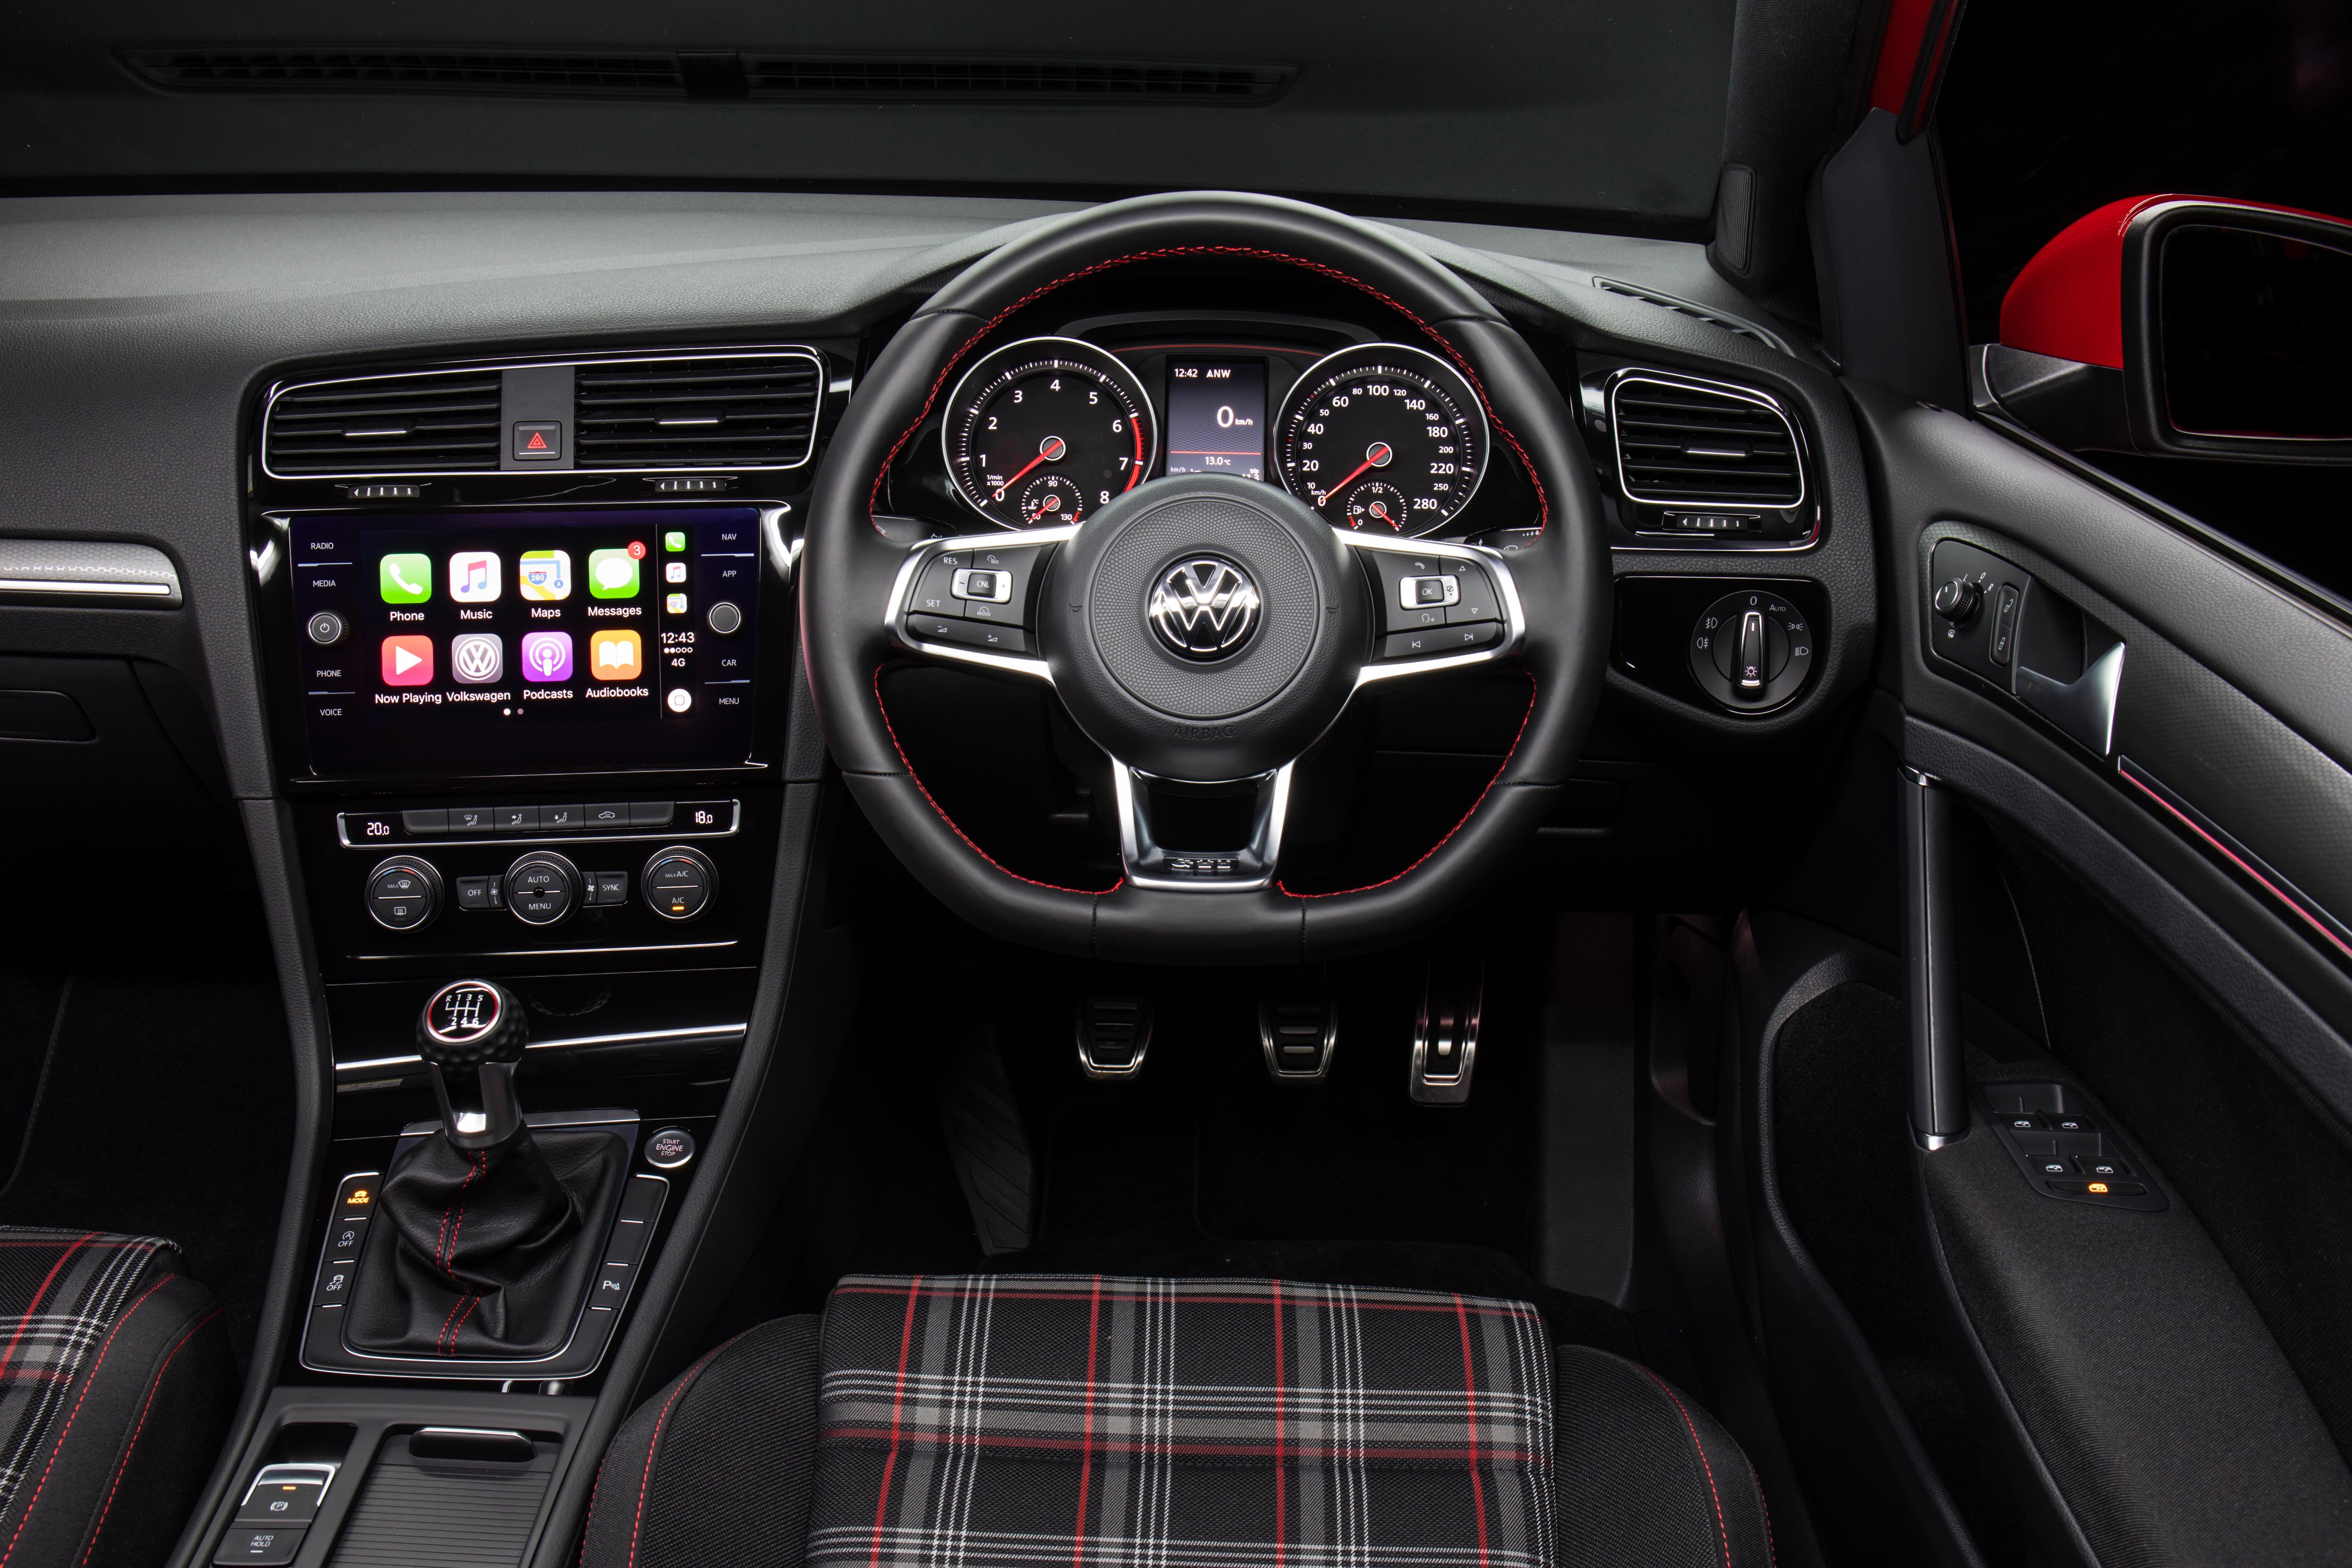 2017 Volkswagen Golf GTI 7.5.